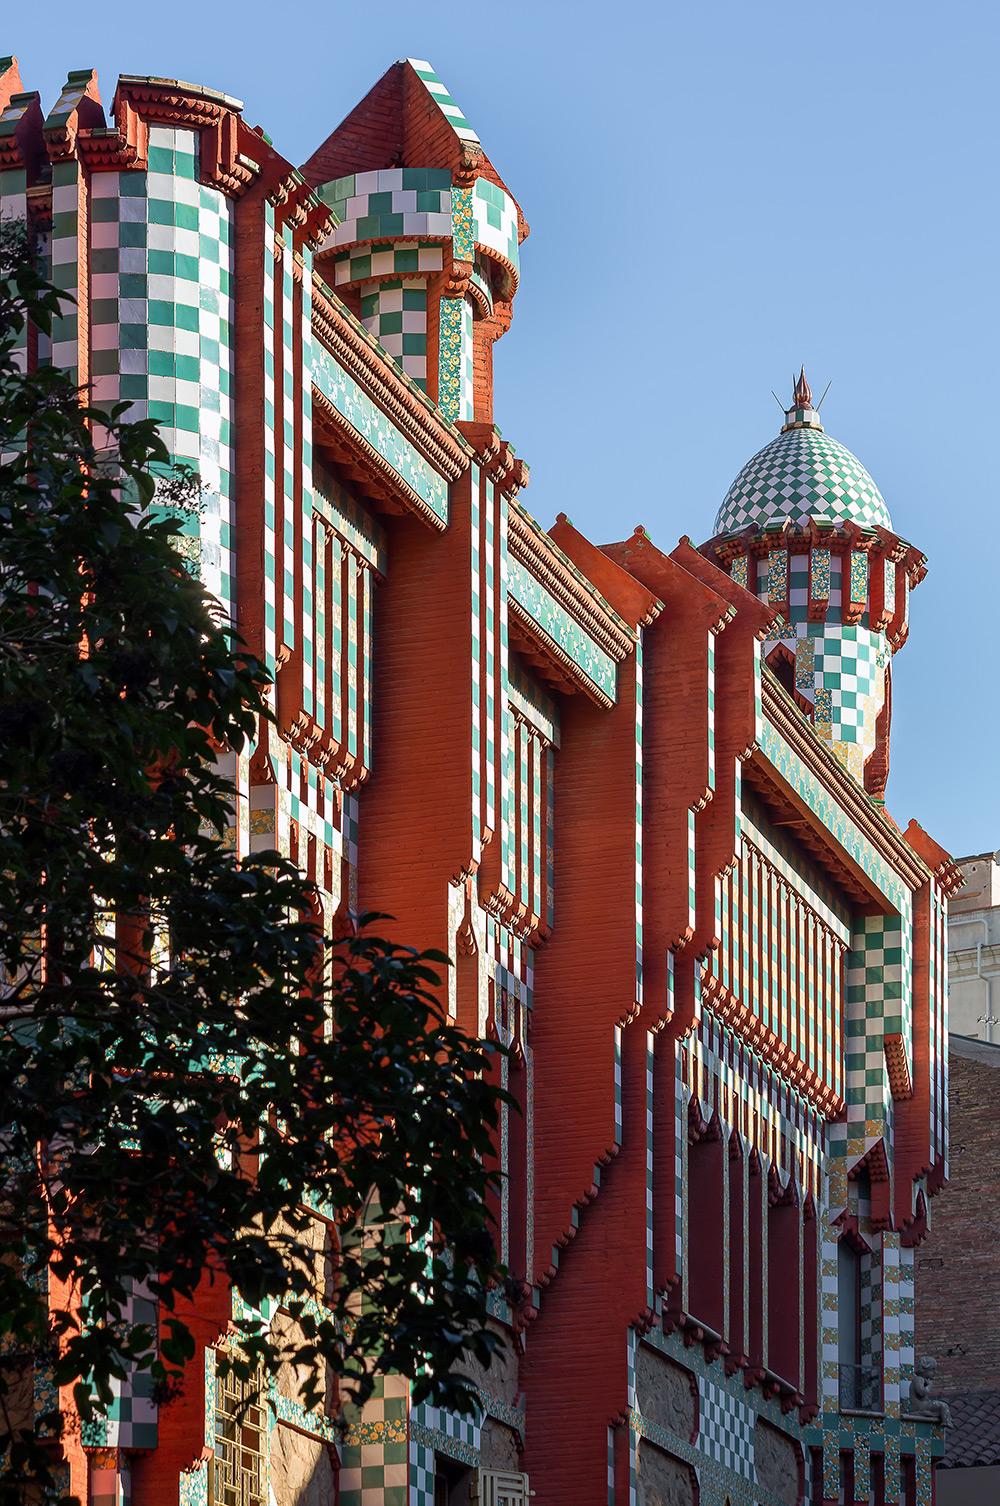 Antoni Gaudi, Antoni Gaudí, architecture, casa vicens, qwelly, qwellyblog, blog, qwellypost, photos, interesting, art, ხელოვნება, არქიტექტურა, ანტონიო გაუდი, ანტონი გაუდი, გაუდის არქიტექტურა, ქველი, ბლოგი, კასა ვისენსი